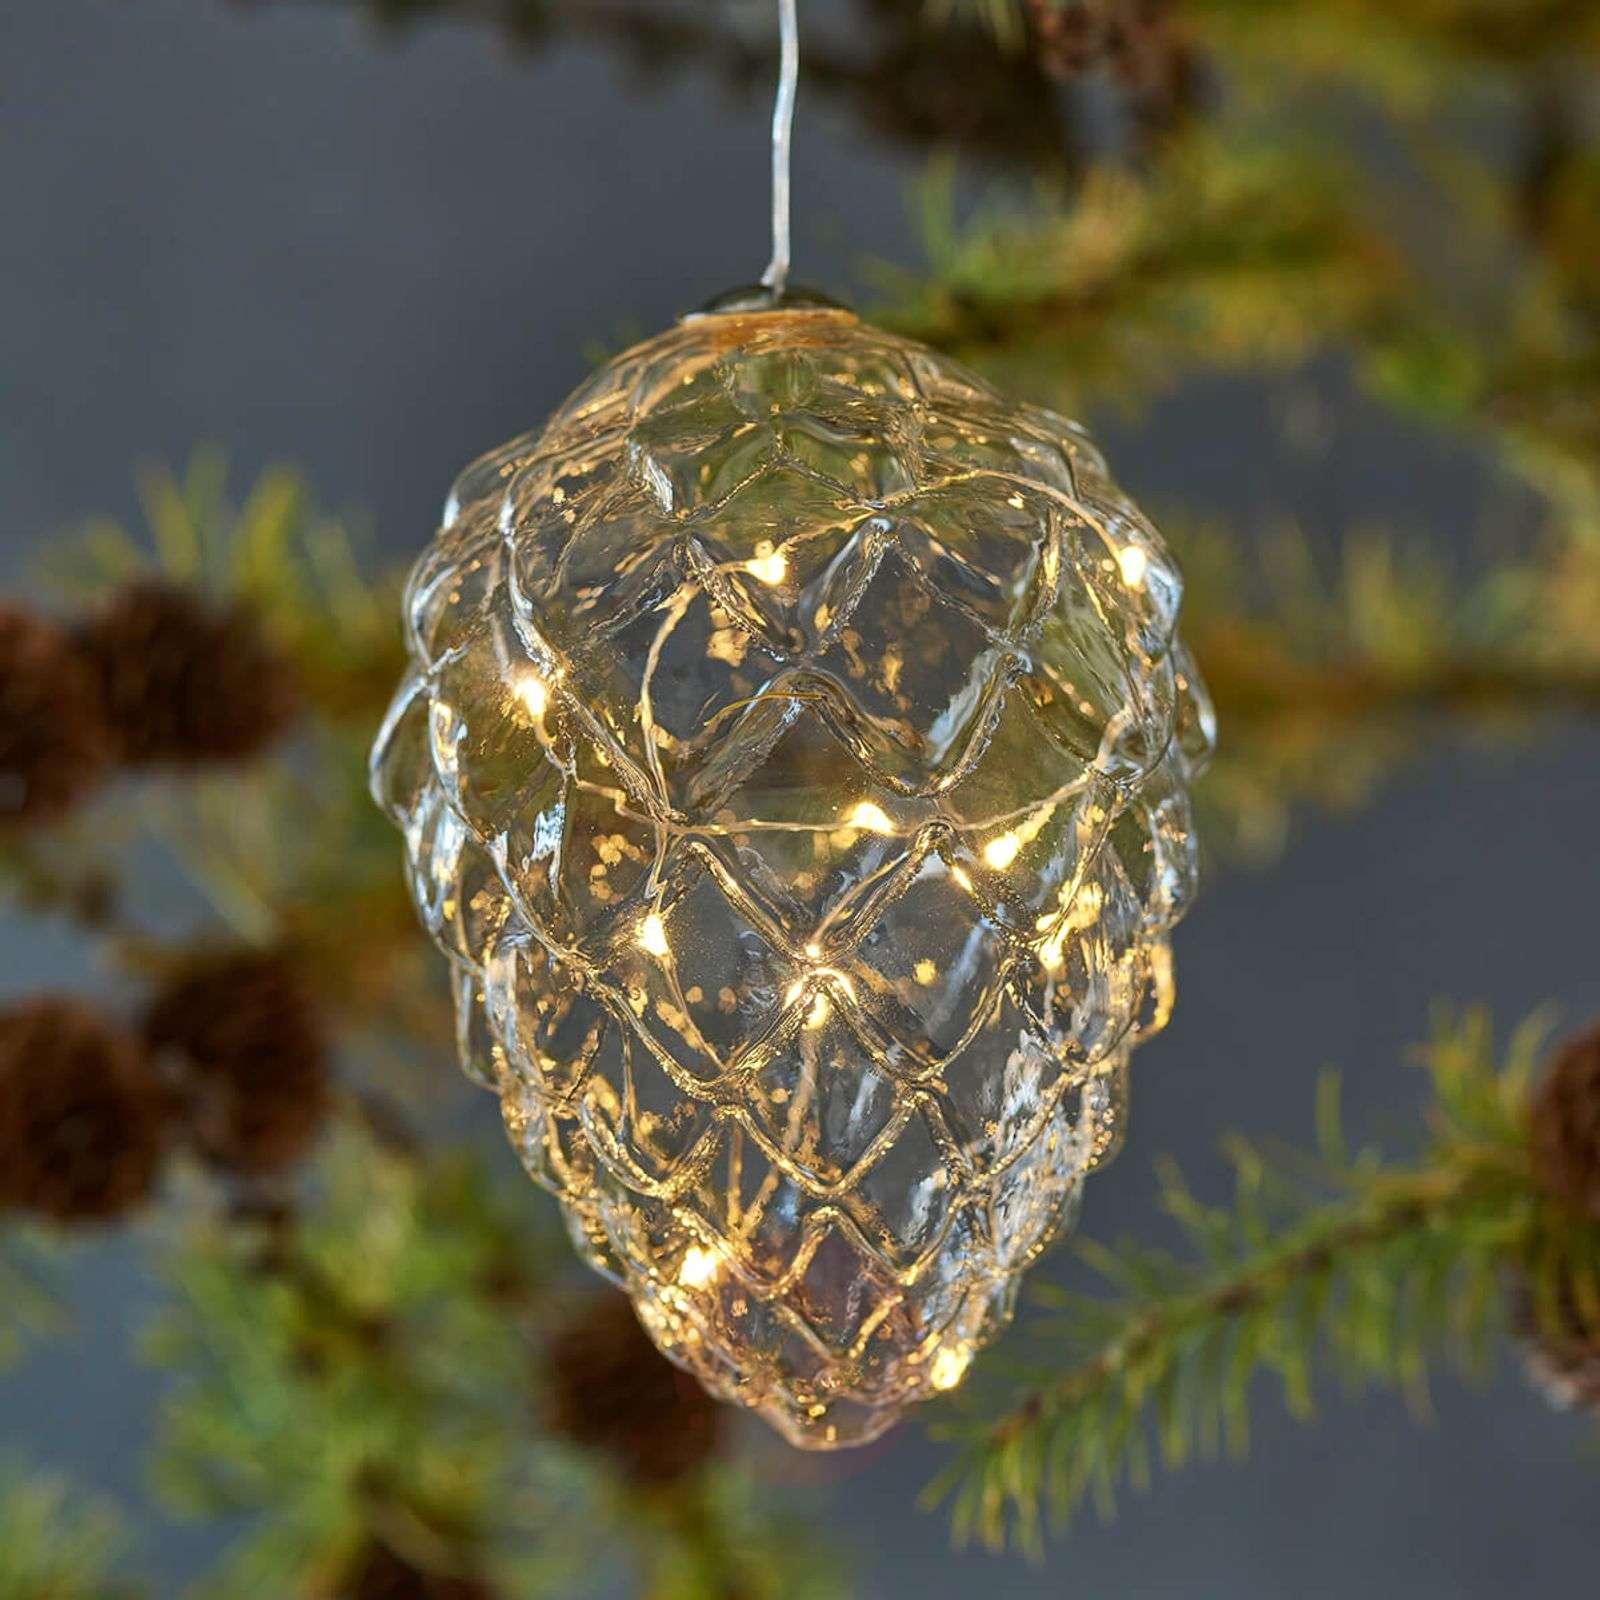 including lights trends lighting decor string strings globe outdoor indoor piebirddesign images com also pictures lanterns decorative led